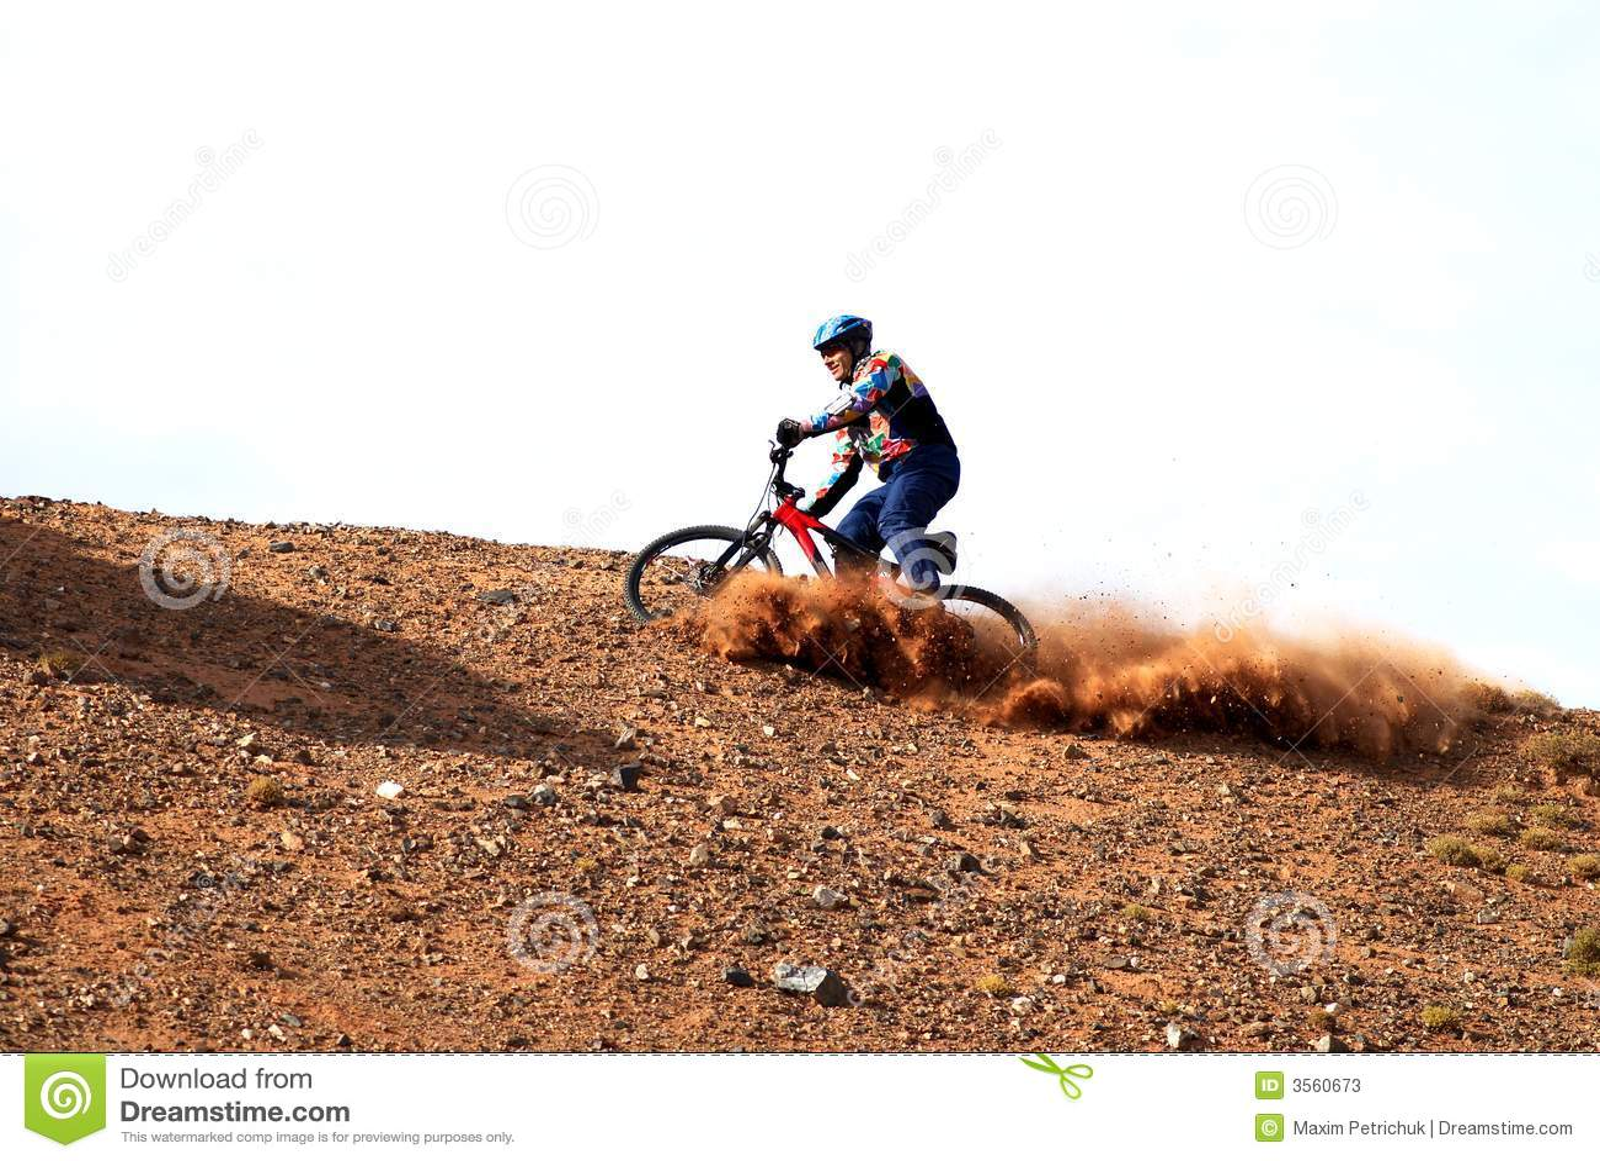 Bici in discesa sulla collina rossa